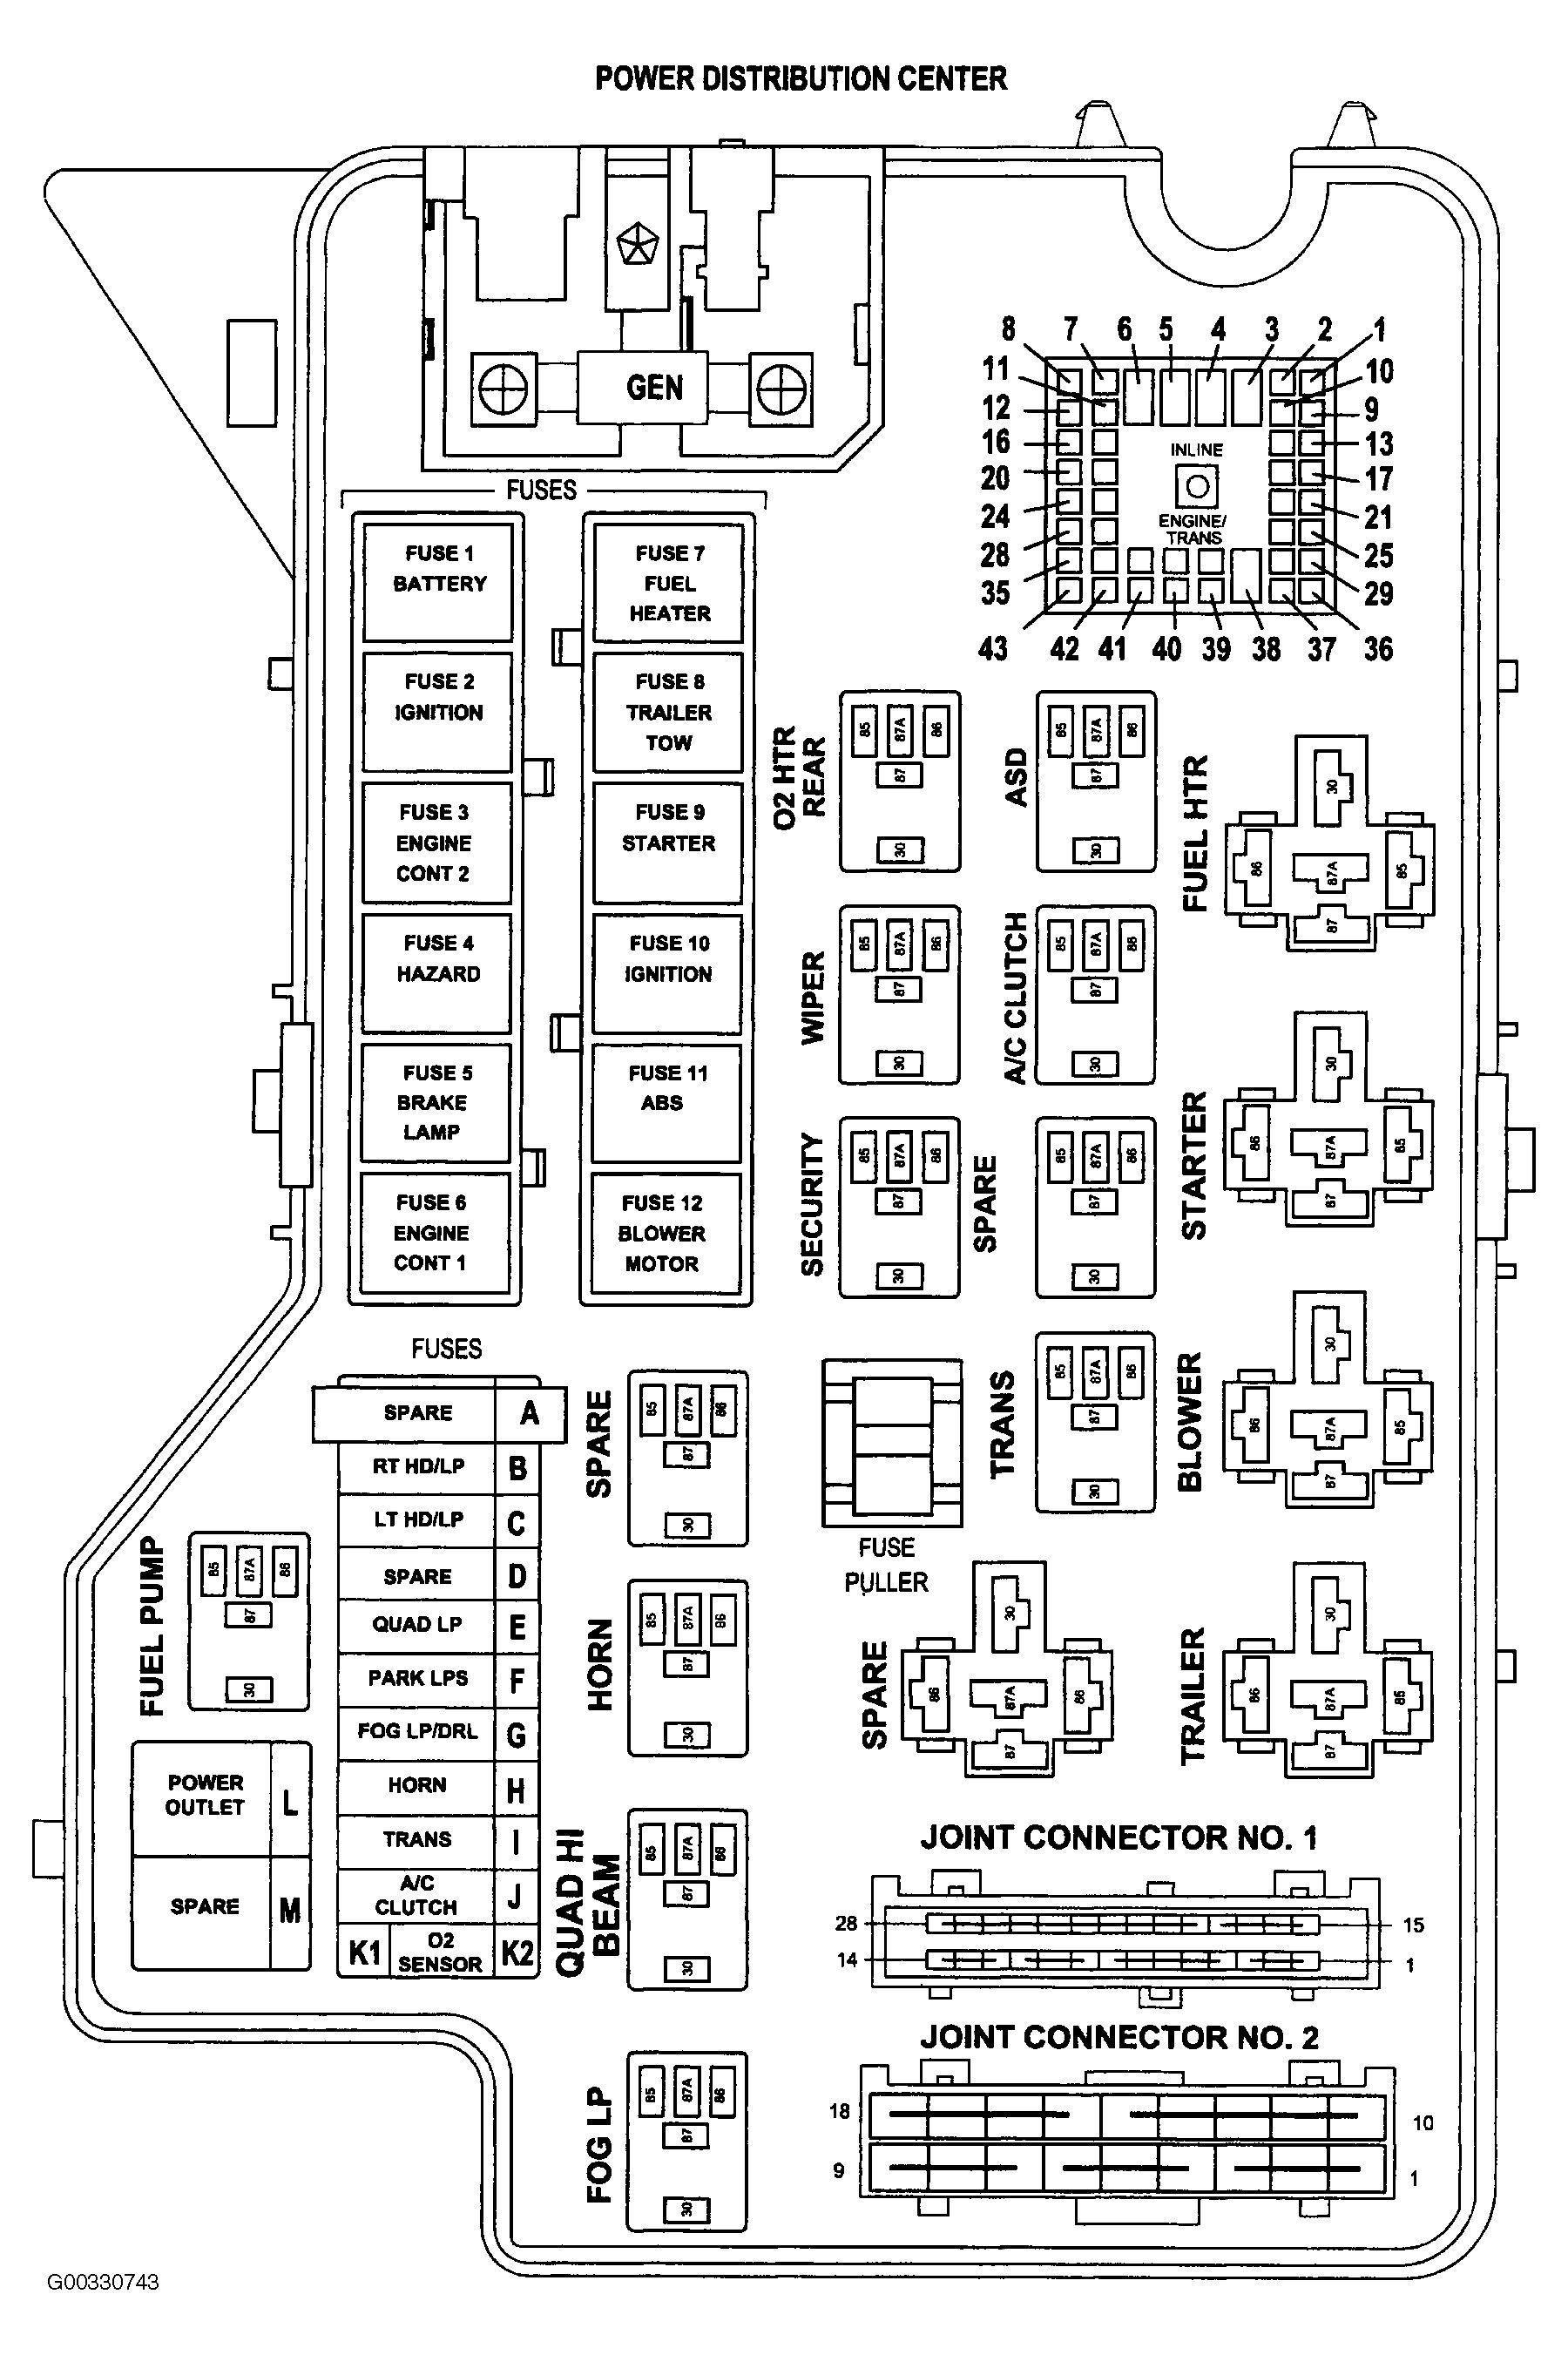 1999 Dodge Ram 1500 Brake Light Diagram In 2020 Dodge Ram 1500 Dodge Ram Ram 1500